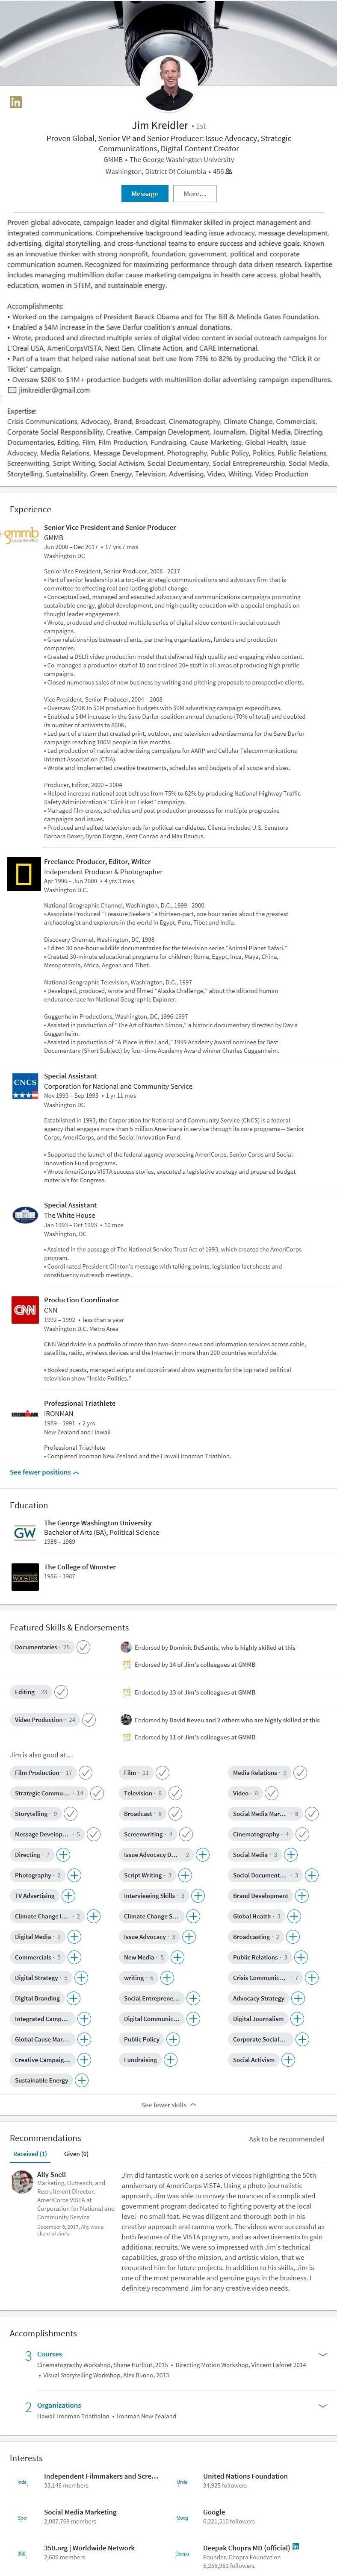 LinkedIn Profile Sample Communications Public Relations Media